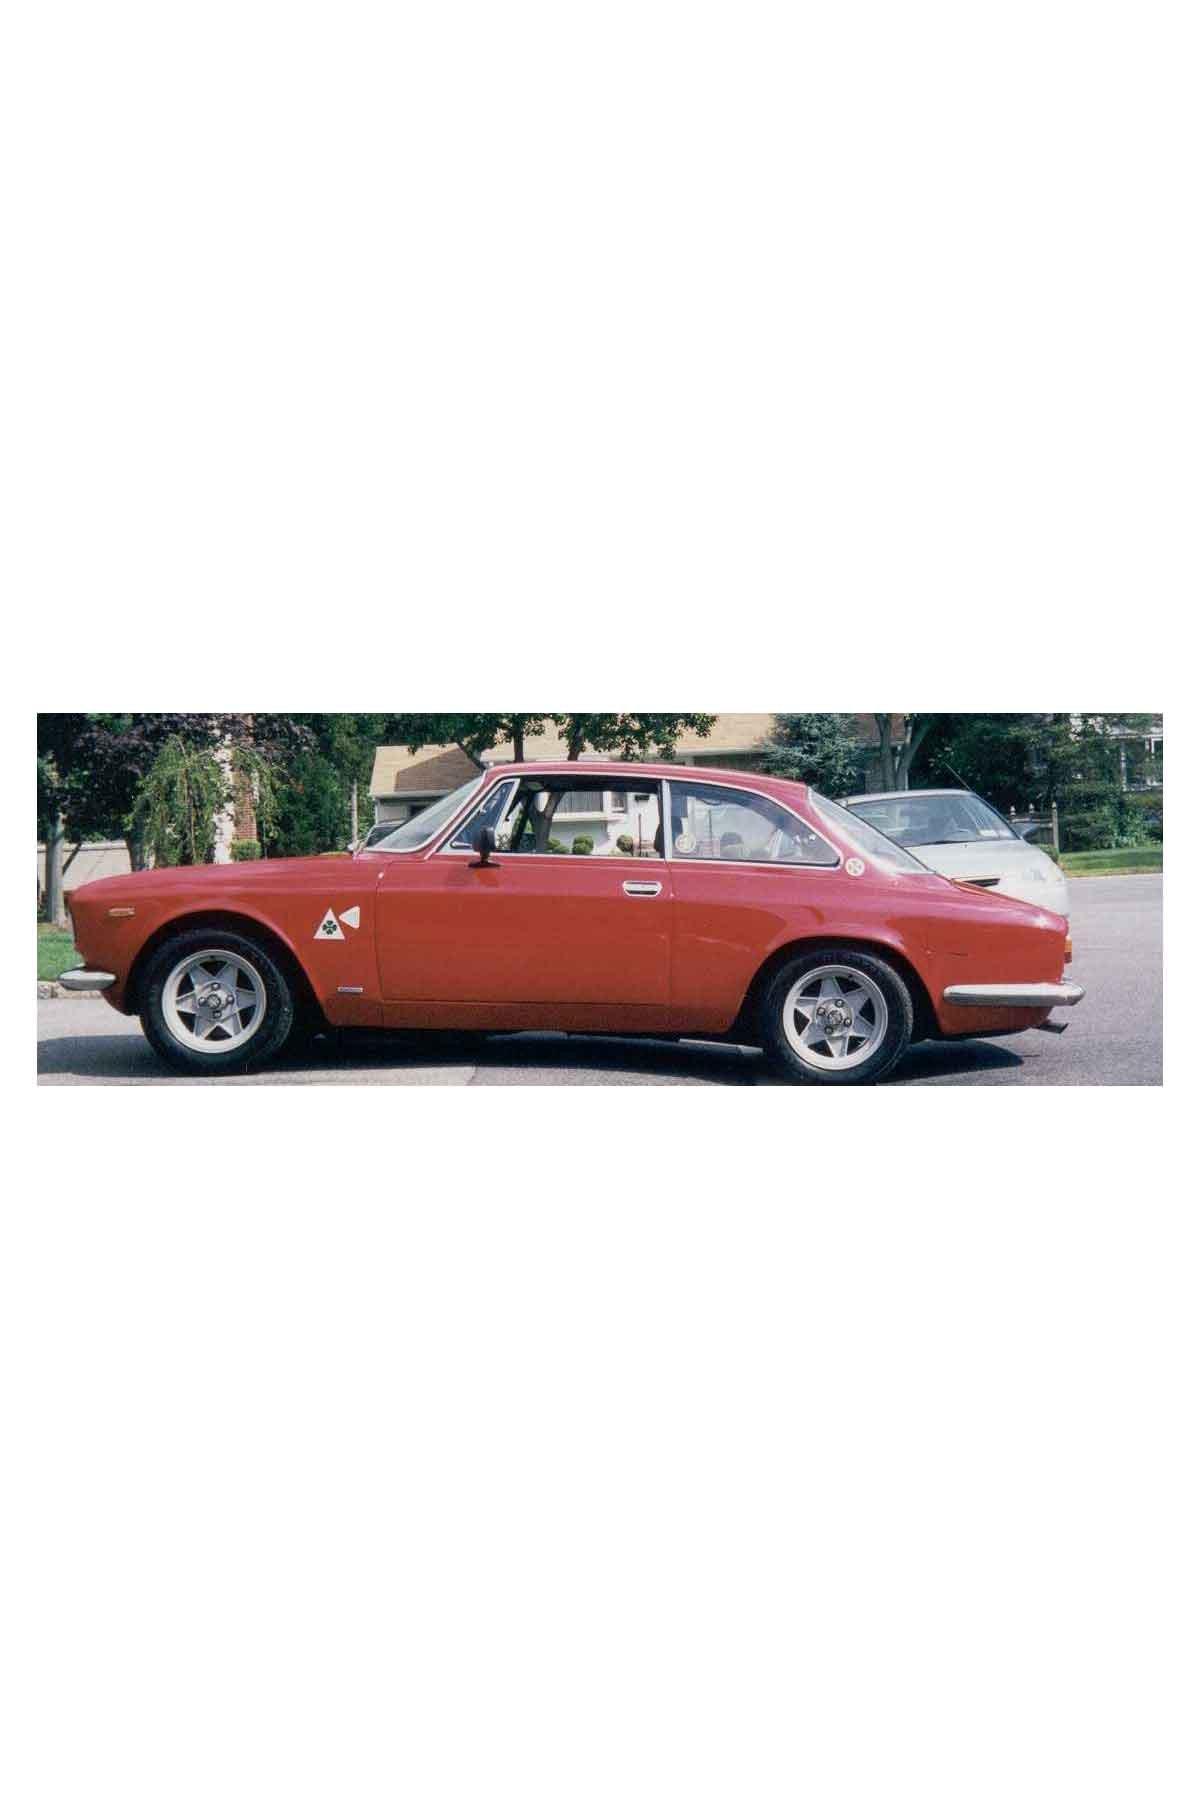 My 1964 Giulia Sprint Veloce